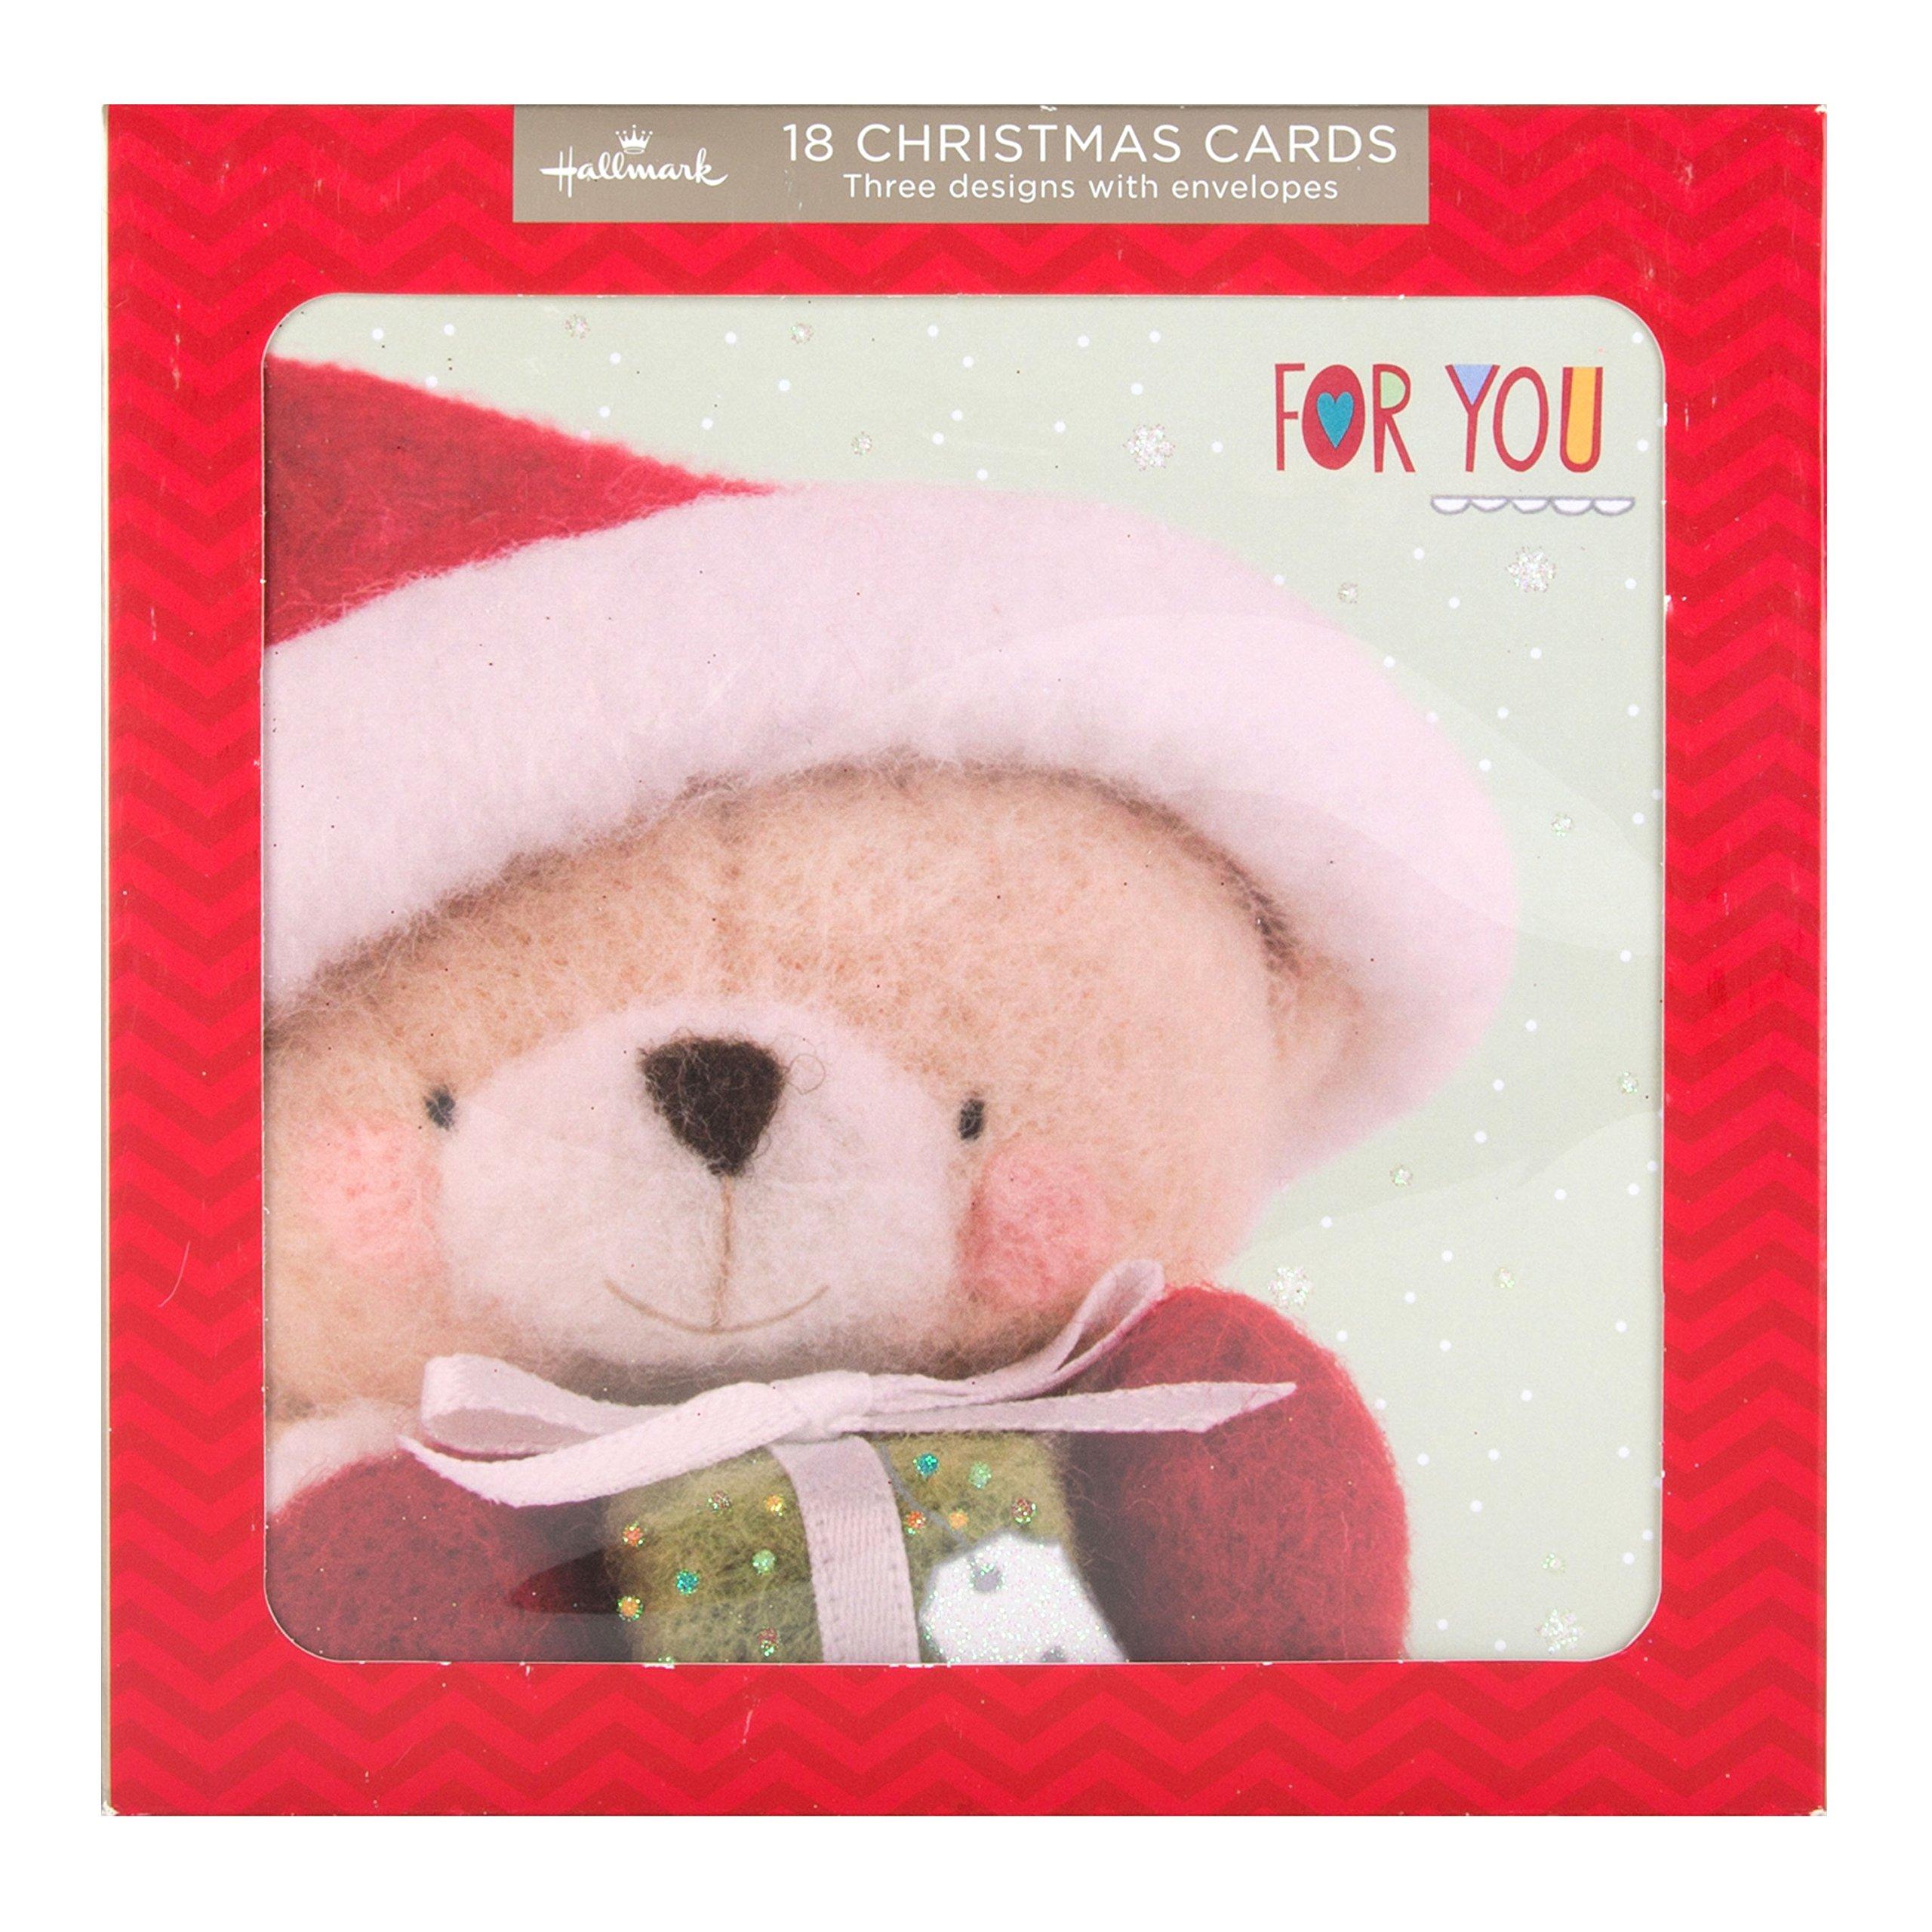 Hallmark Bumper Christmas Card Pack Forever Friends 18 Cards 3 Designs Buy Online In Guernsey At Desertcart